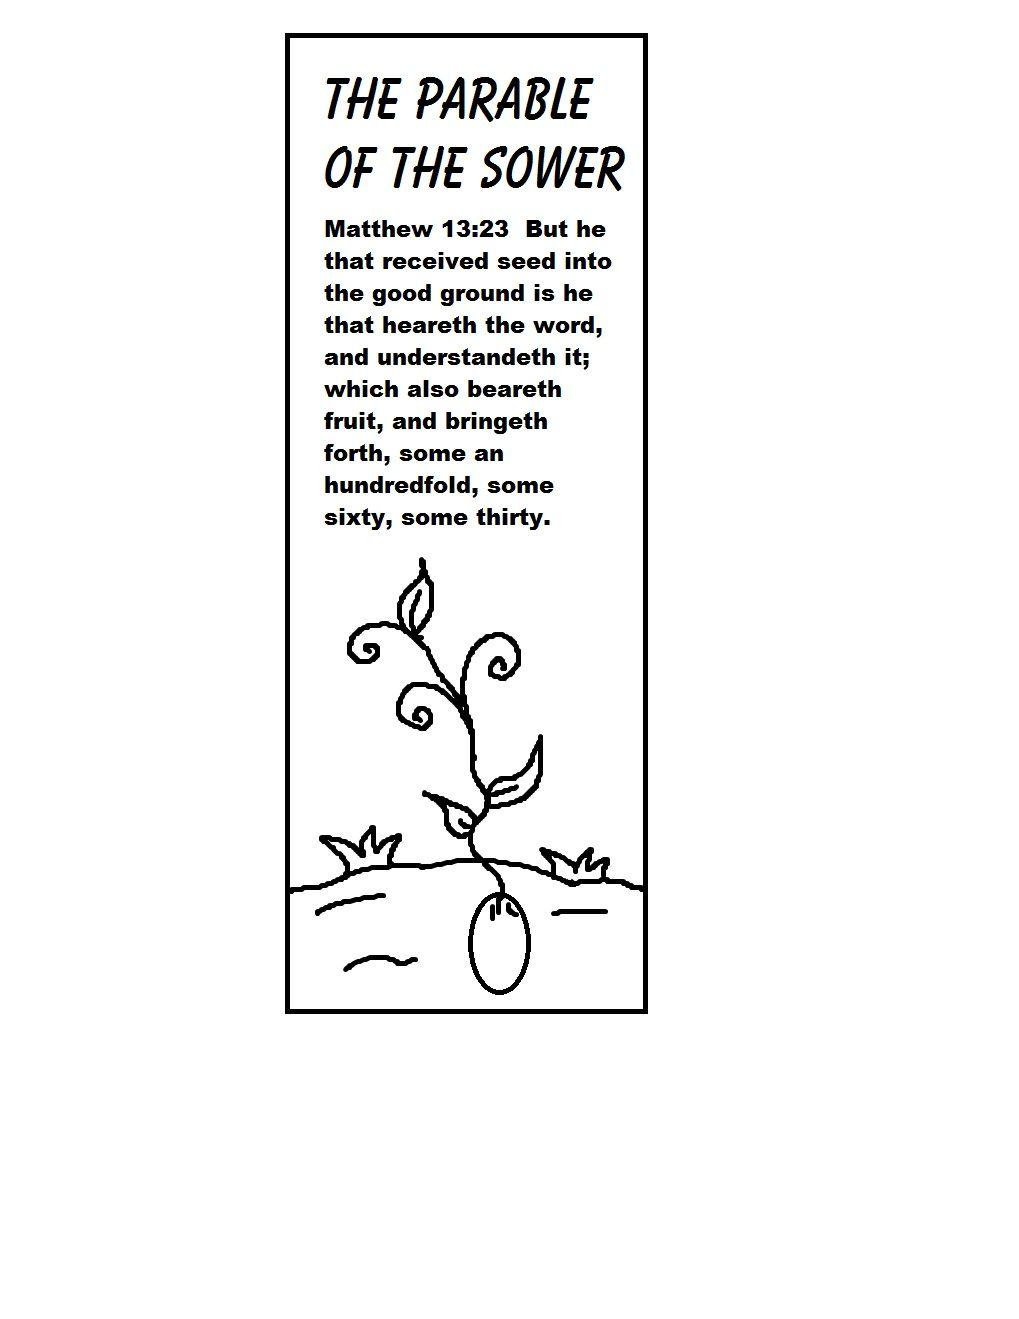 parable of the sower | The Parable of The Sower Sunday